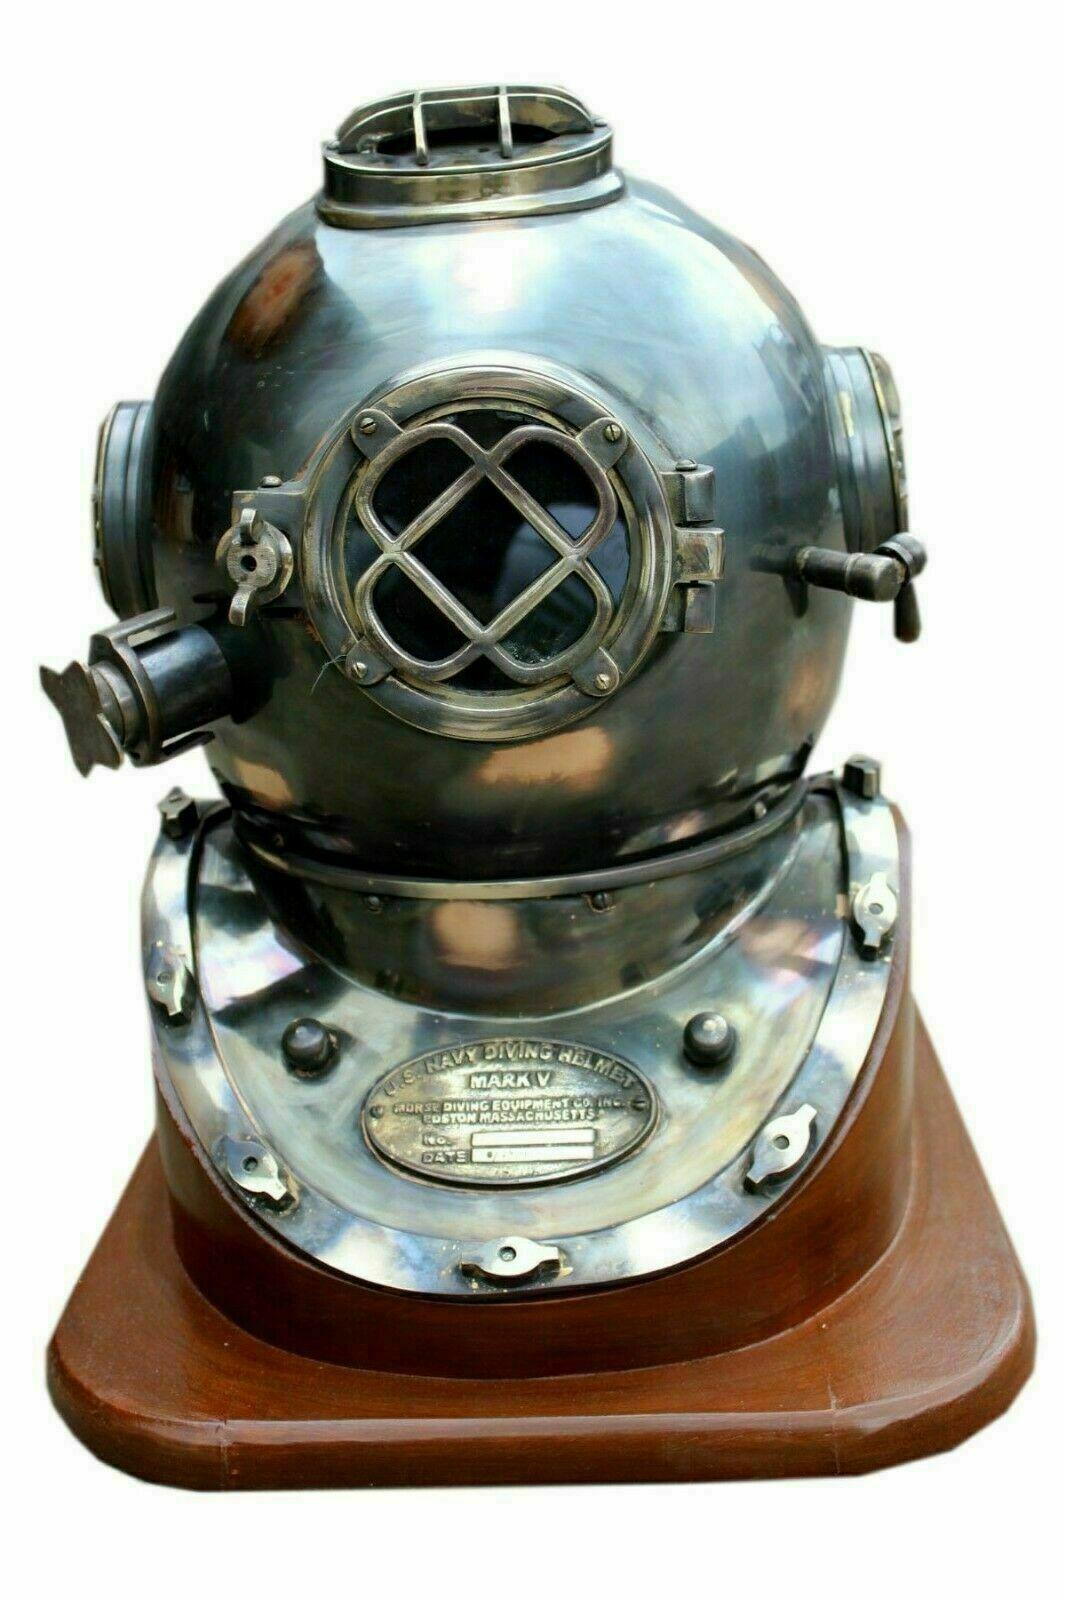 18 Inch US Navy Diving Helmet Mark V Deep Sea Divers Helmet Vintage Scuba Gift - $236.55